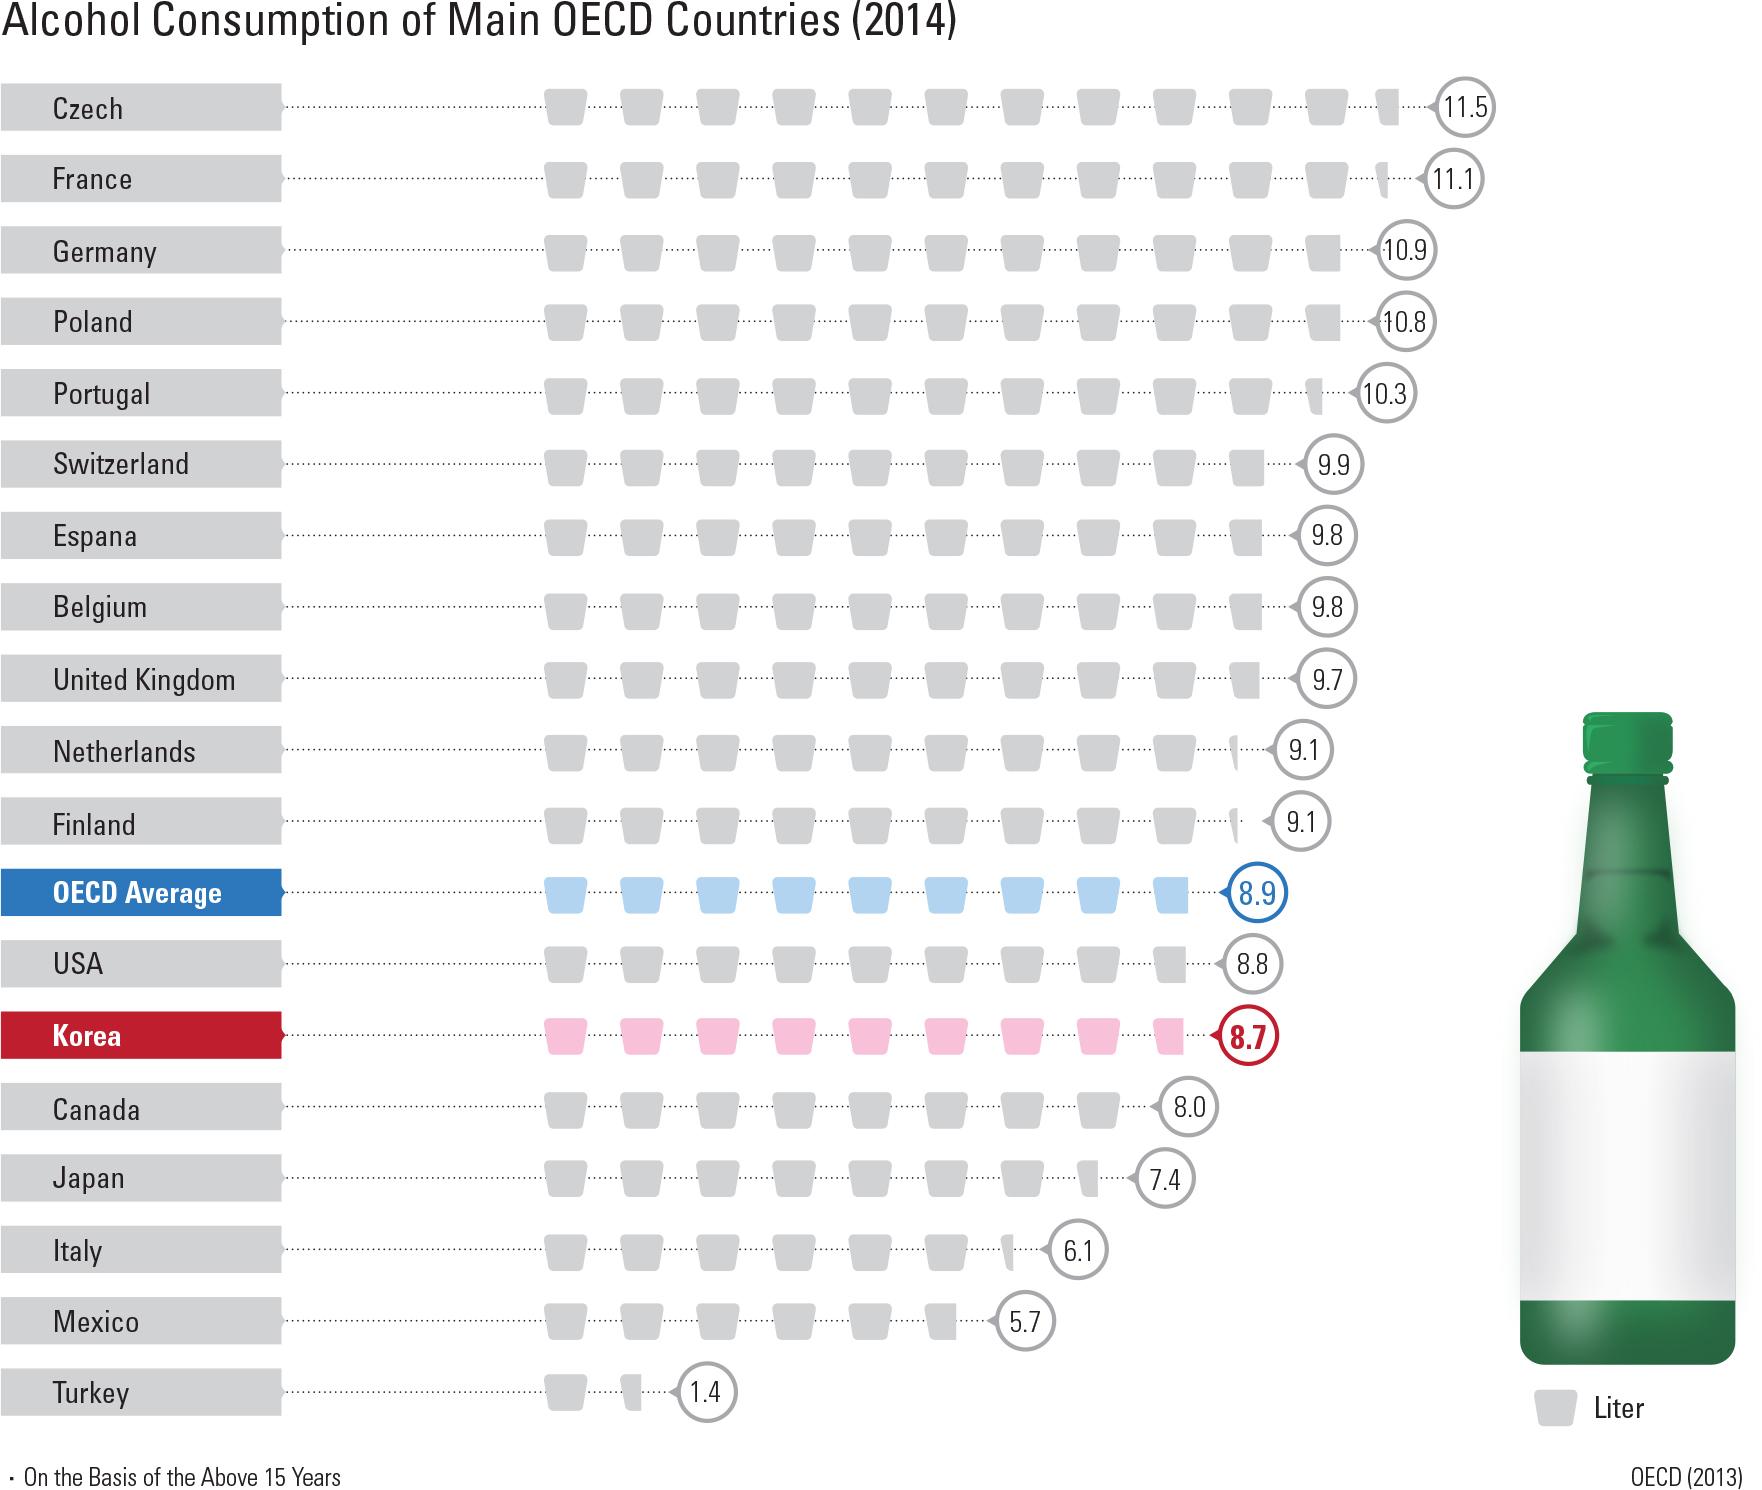 "Alcohol Consumption of Main OECD Countries (2014)<p class=""oz_zoom"" zimg=""http://imagedata.cafe24.com/us_3/us3_234-2_2.jpg""><span style=""font-family:Nanum Myeongjo;""><span style=""font-size:18px;""><span class=""label label-danger"">UPDATE DATA</span></span></p>"